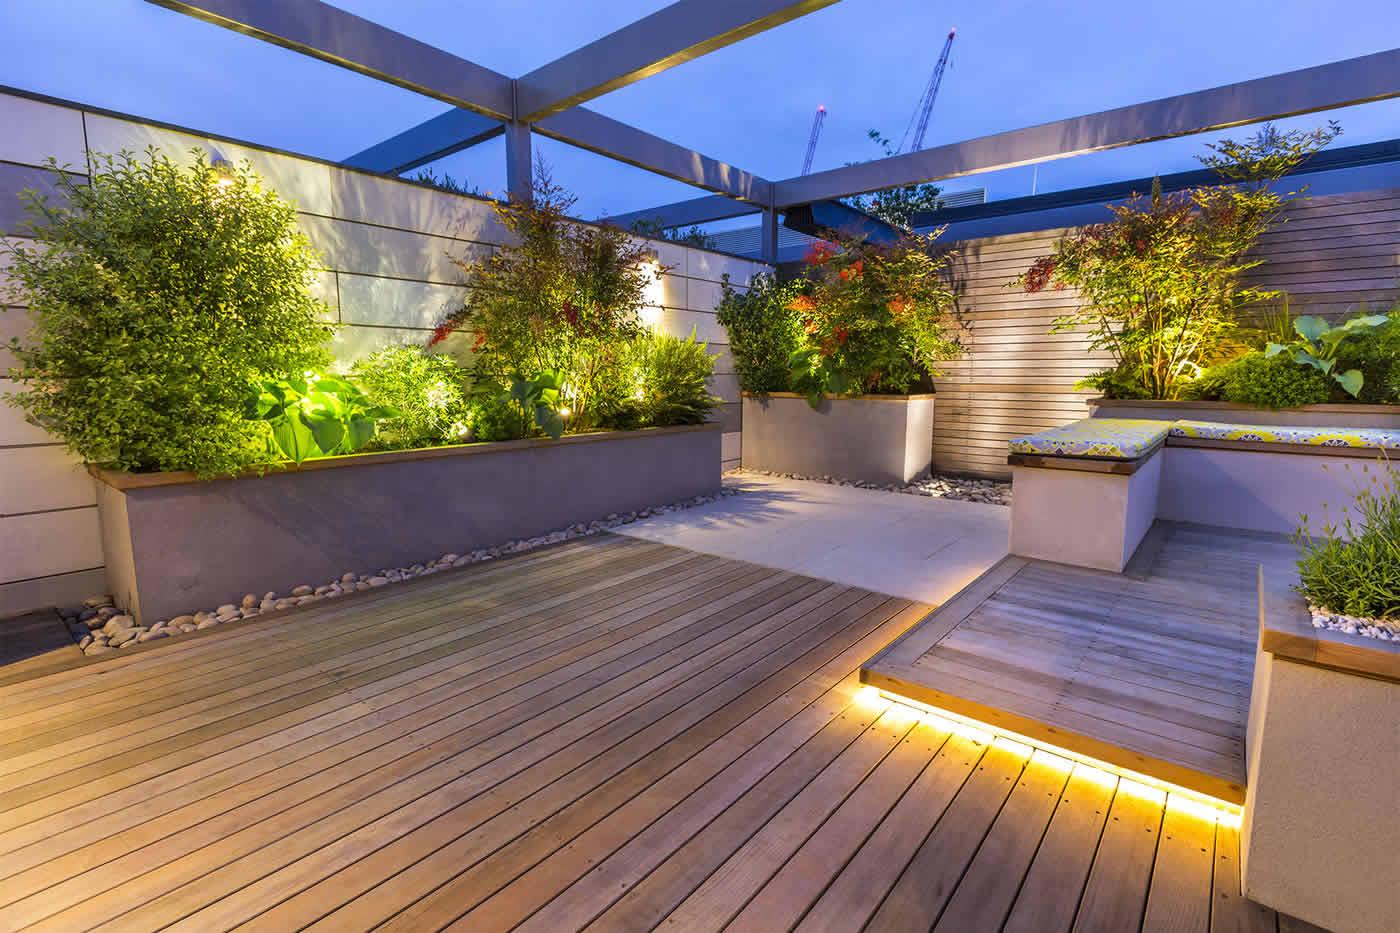 Roof terrace design penthouse apartment king 39 s cross for Decking terrace garden